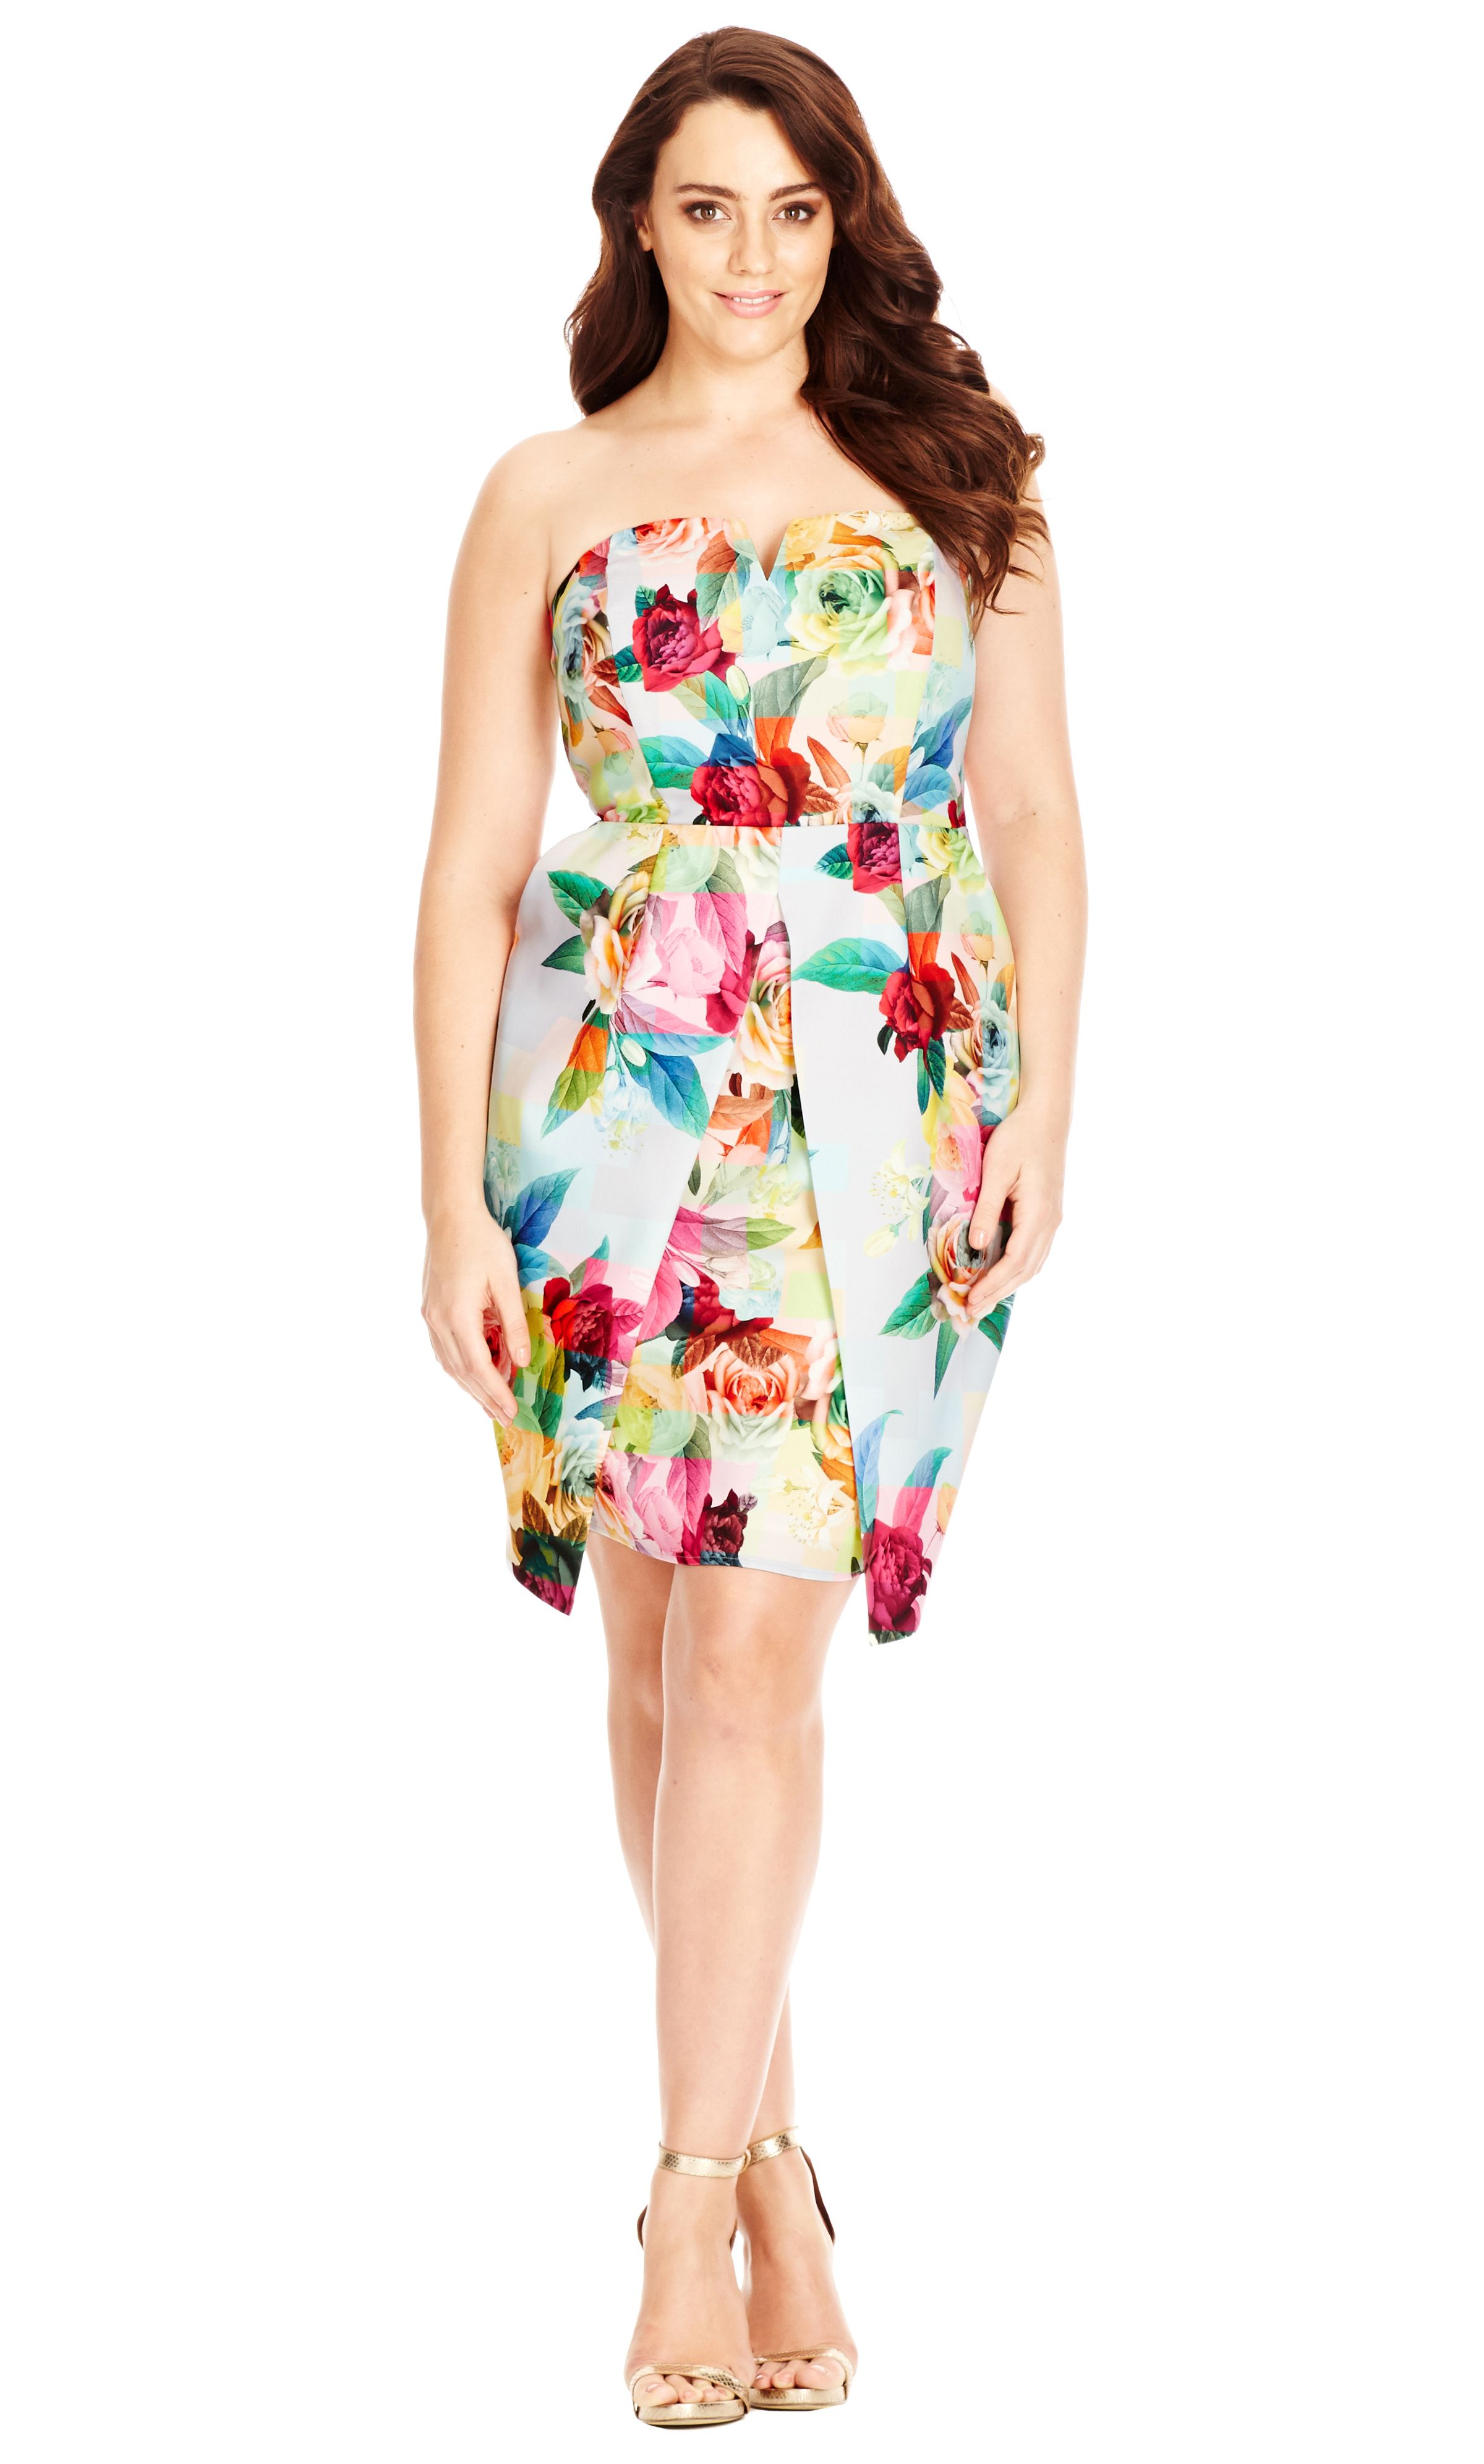 1ba58528fca City Chic Geo Floral Dress - Women s Plus Size Fashion City Chic - City  Chic Your Leading Plus Size Fashion Destination  citychic  citychiconline  ...